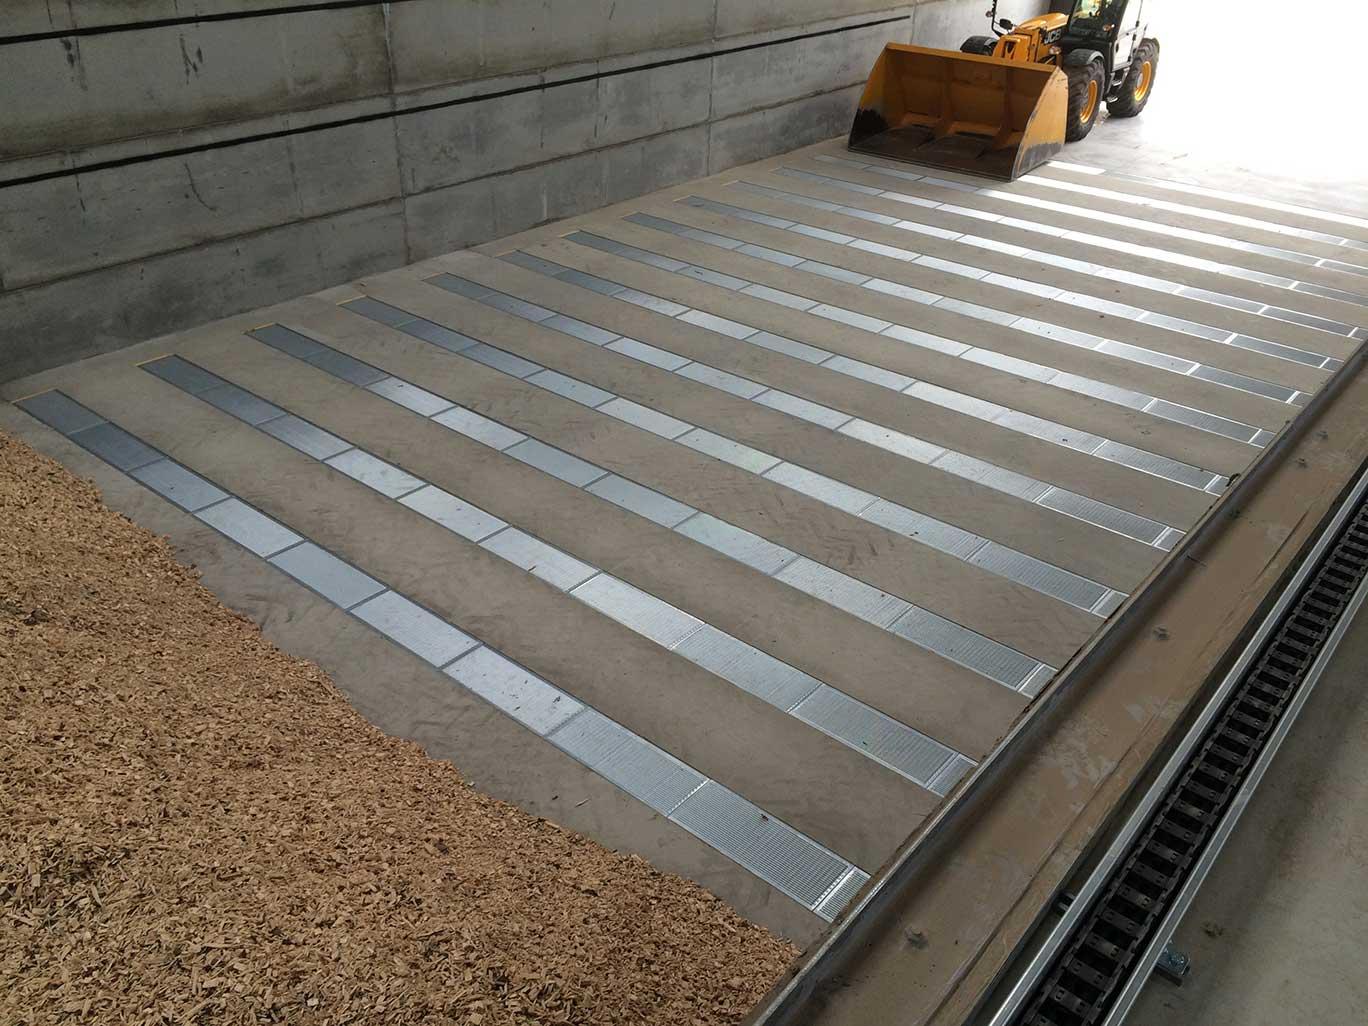 Wooden Grain Drying Floors On Floor Grain Drying Systems